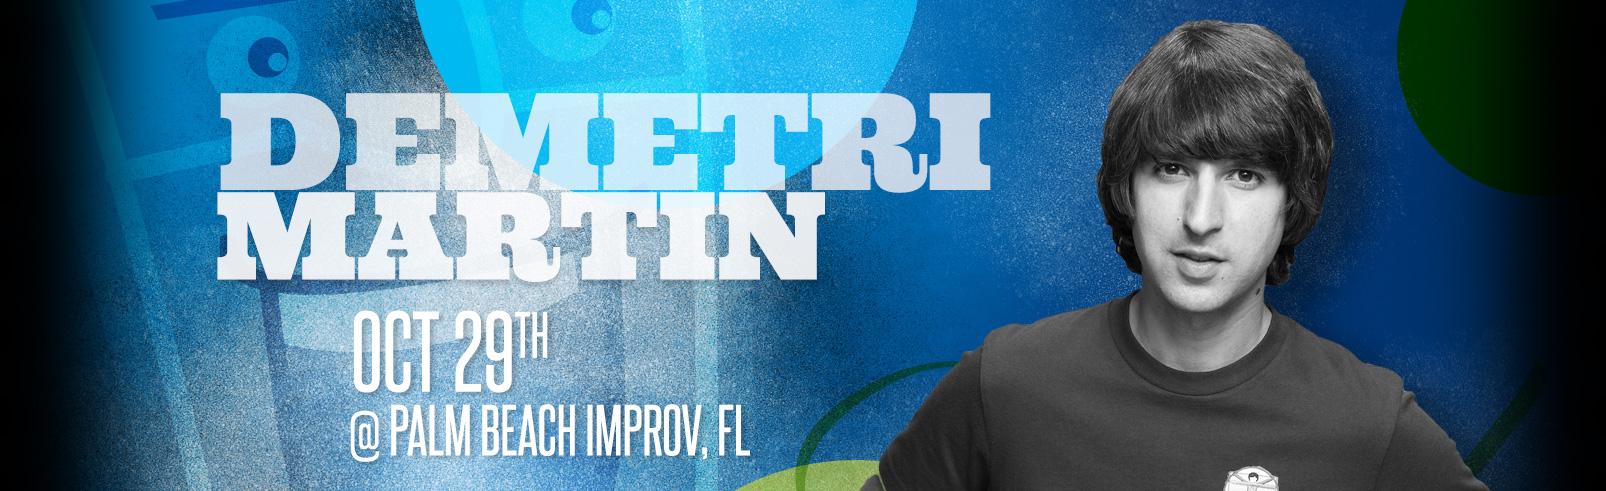 Demetri Martin @ Palm Beach Improv